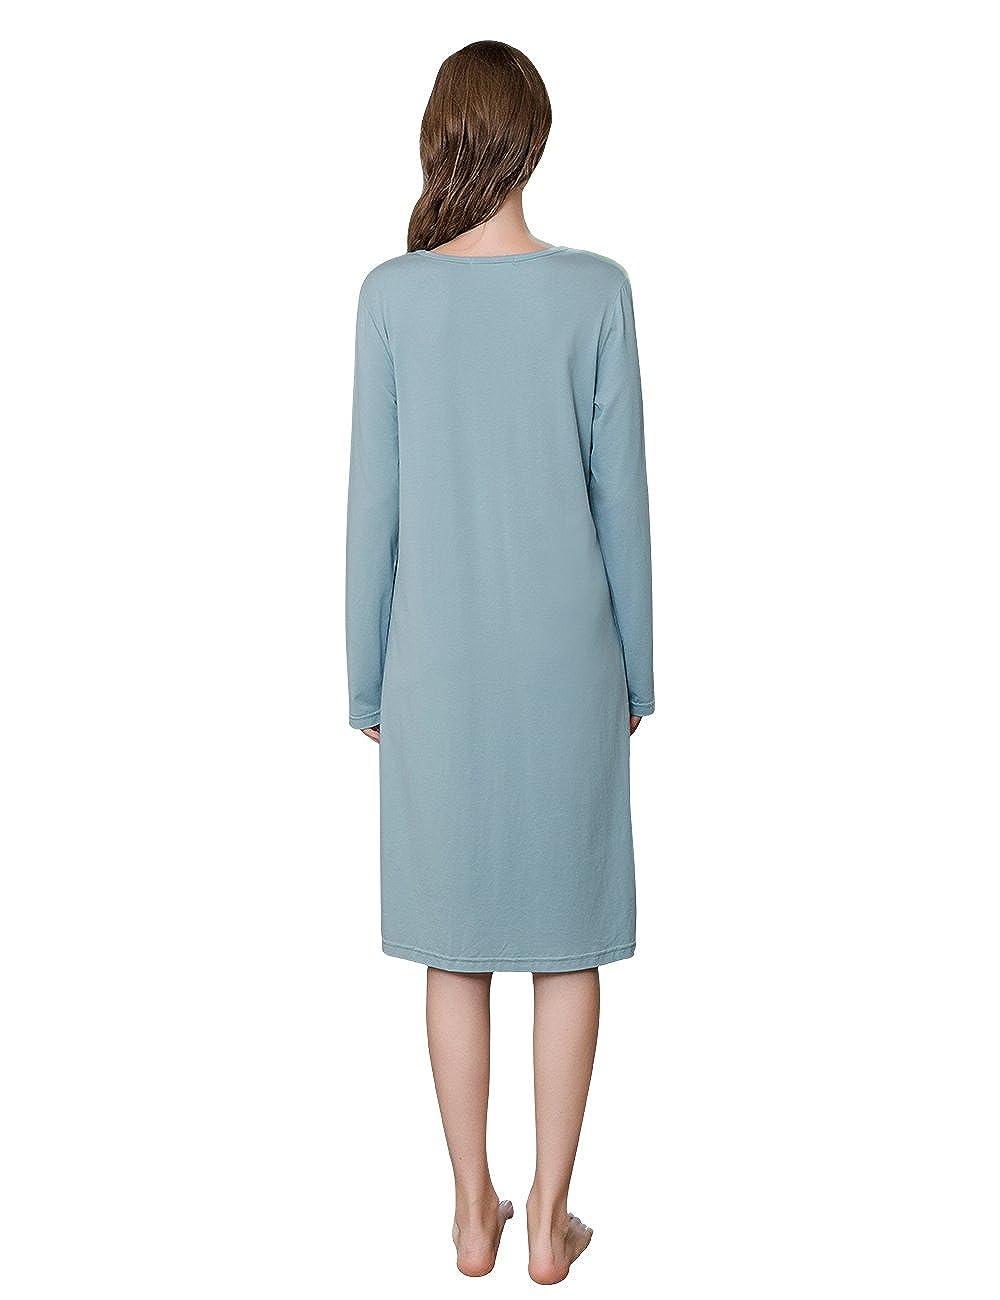 QIANXIU Women  s Summer New Nightgown Long Sleeved Modal Cotton Knit Sleep  Skirt Nightshirt at Amazon Women s Clothing store  39b85cf67